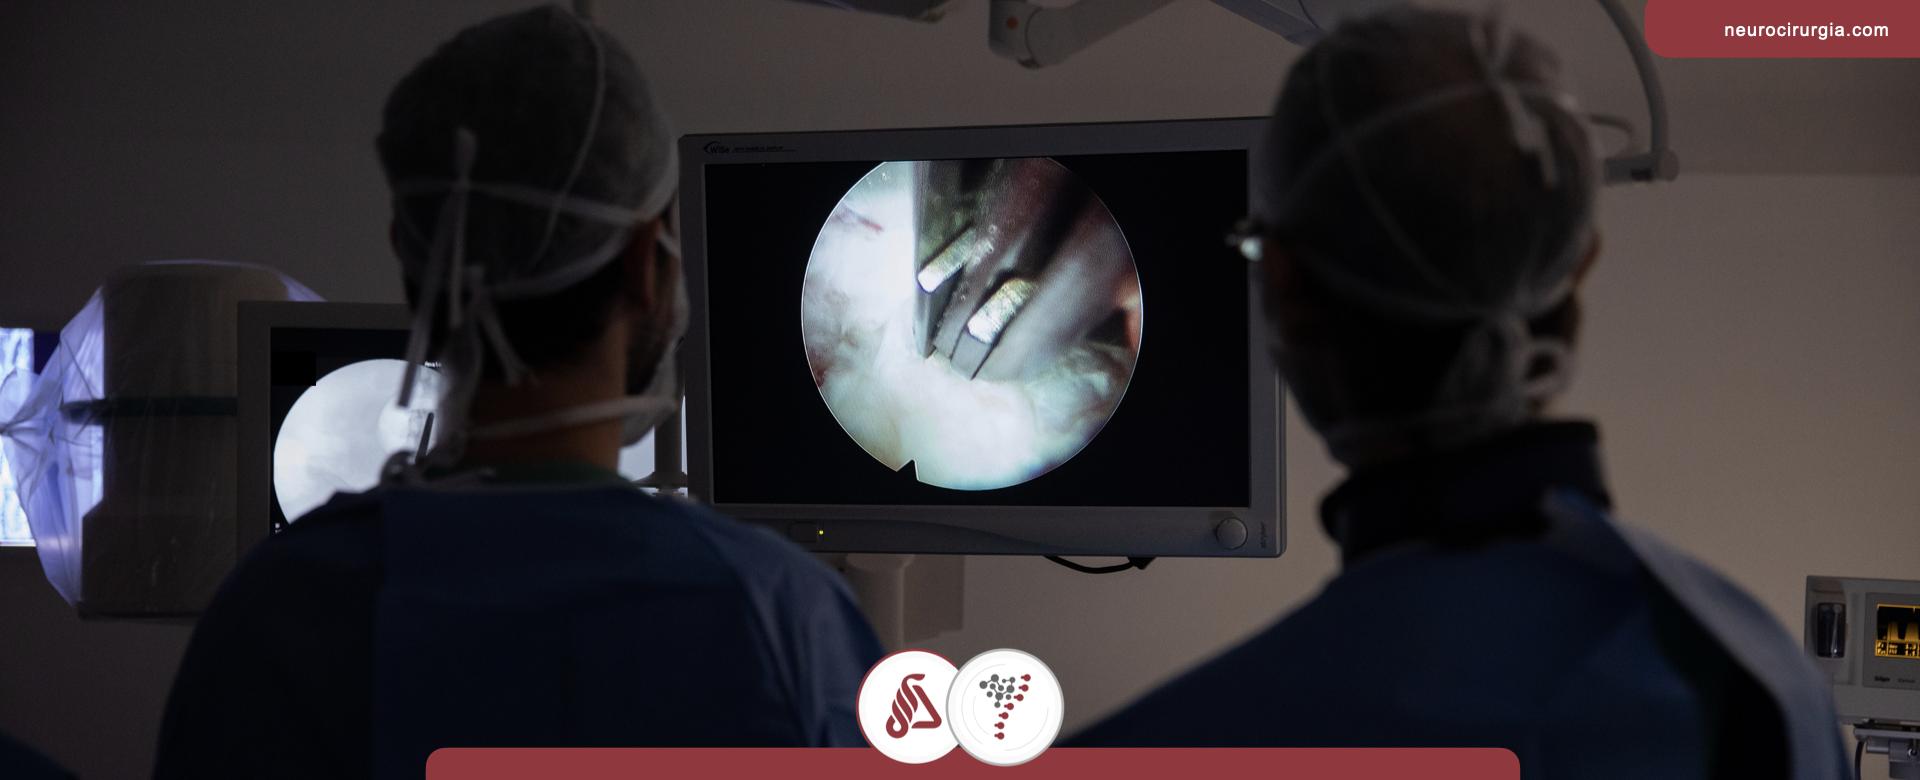 Endoscopia da coluna cervical